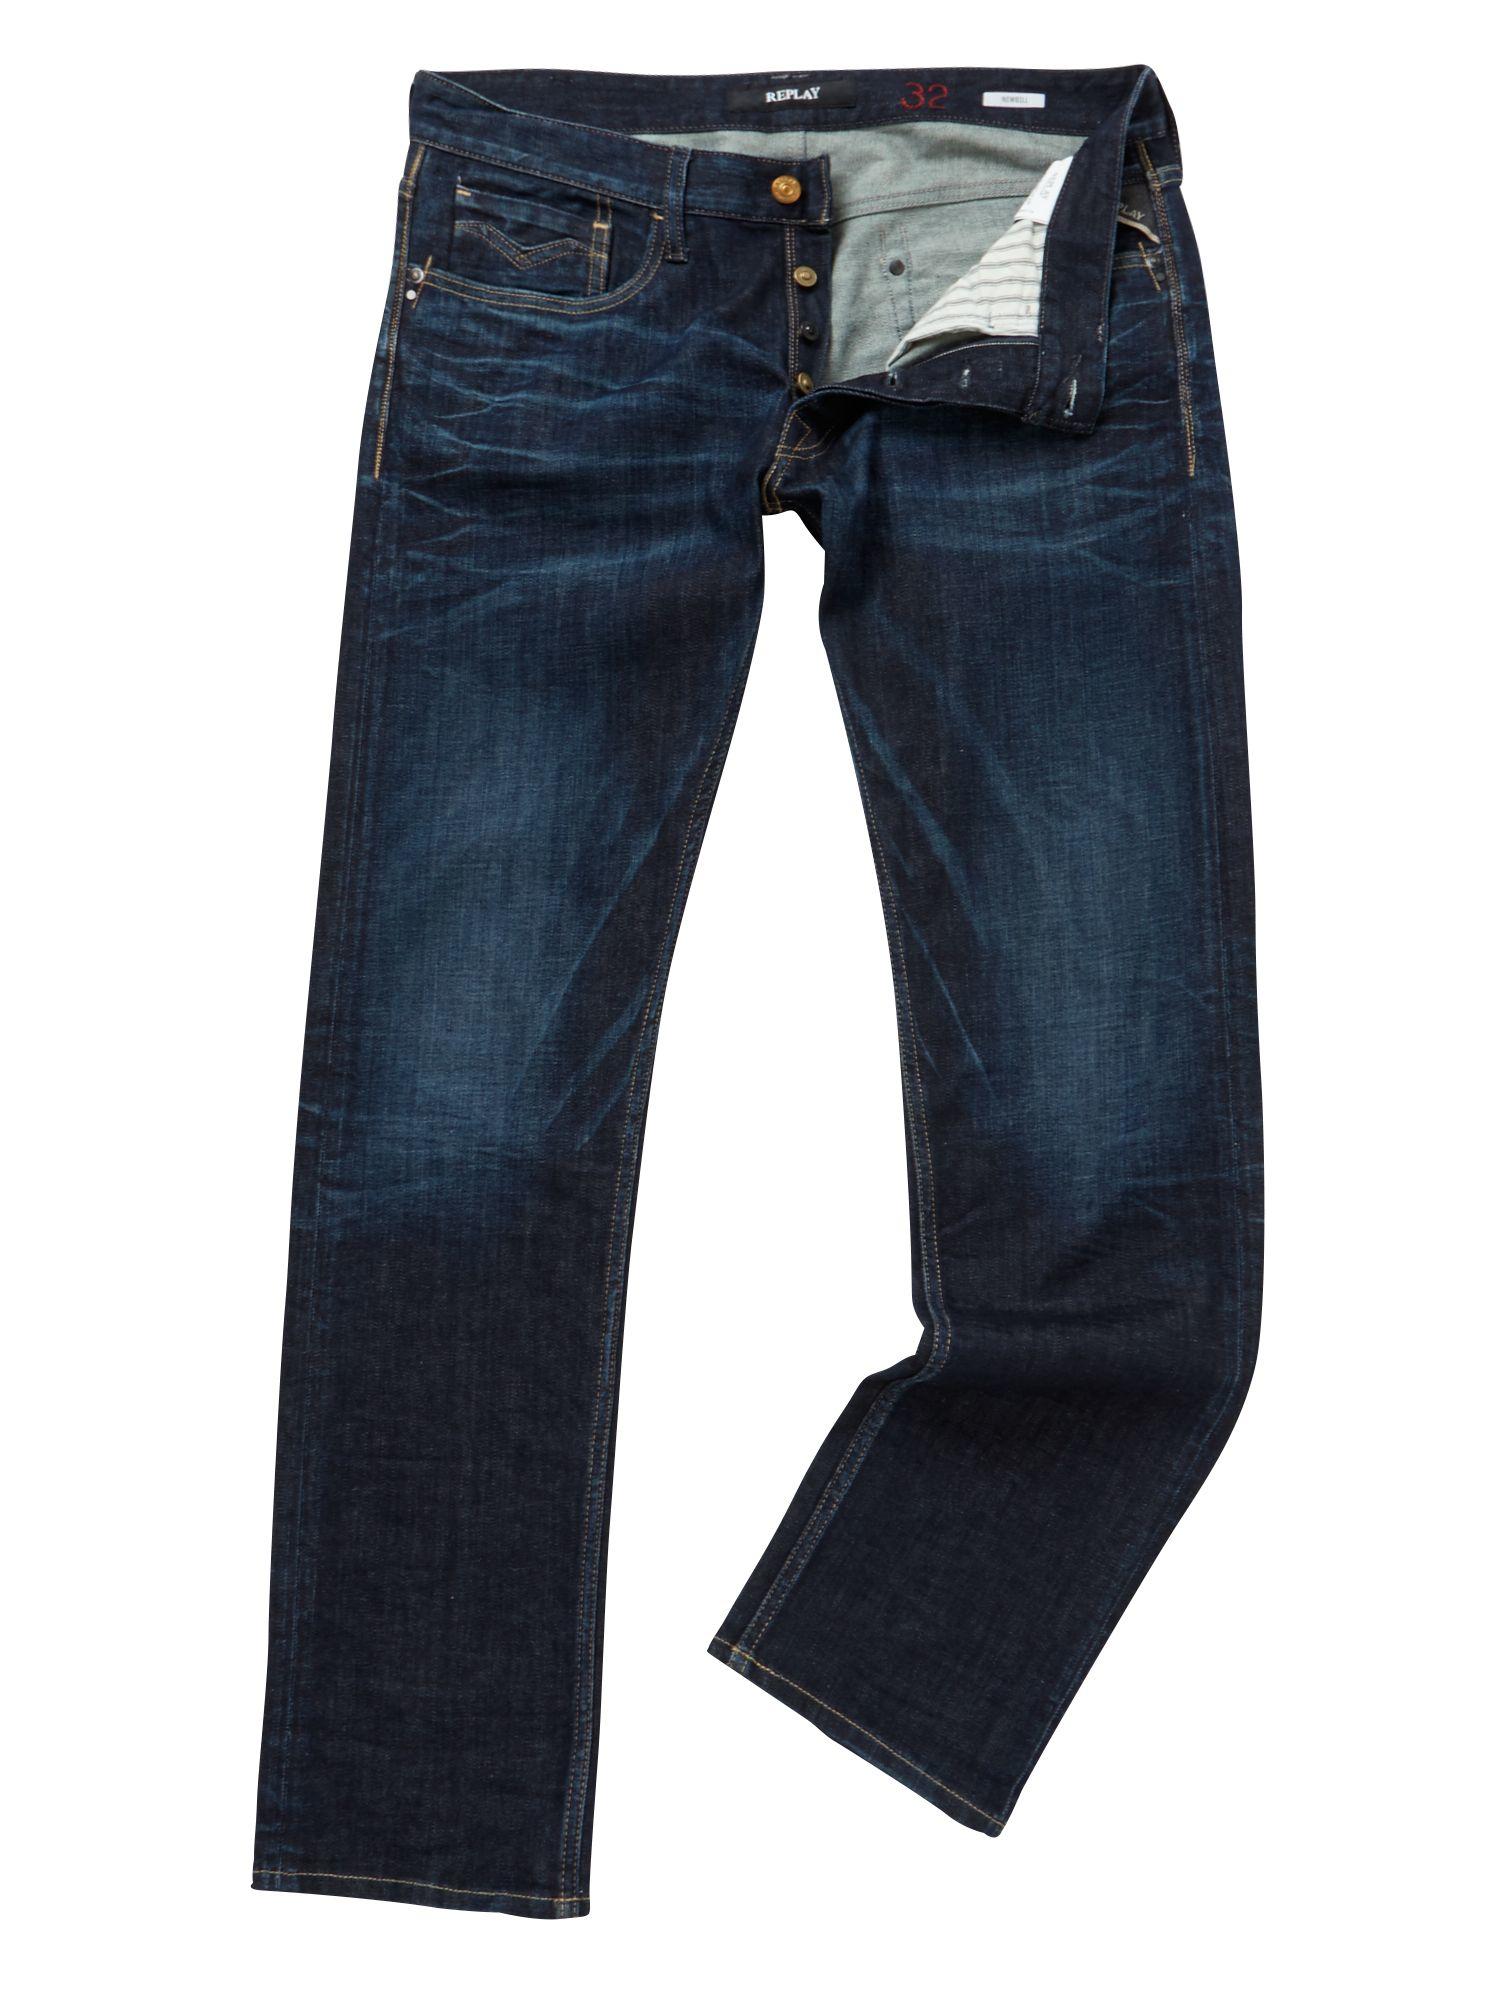 replay waitom regular slim fit jean in blue for men lyst. Black Bedroom Furniture Sets. Home Design Ideas